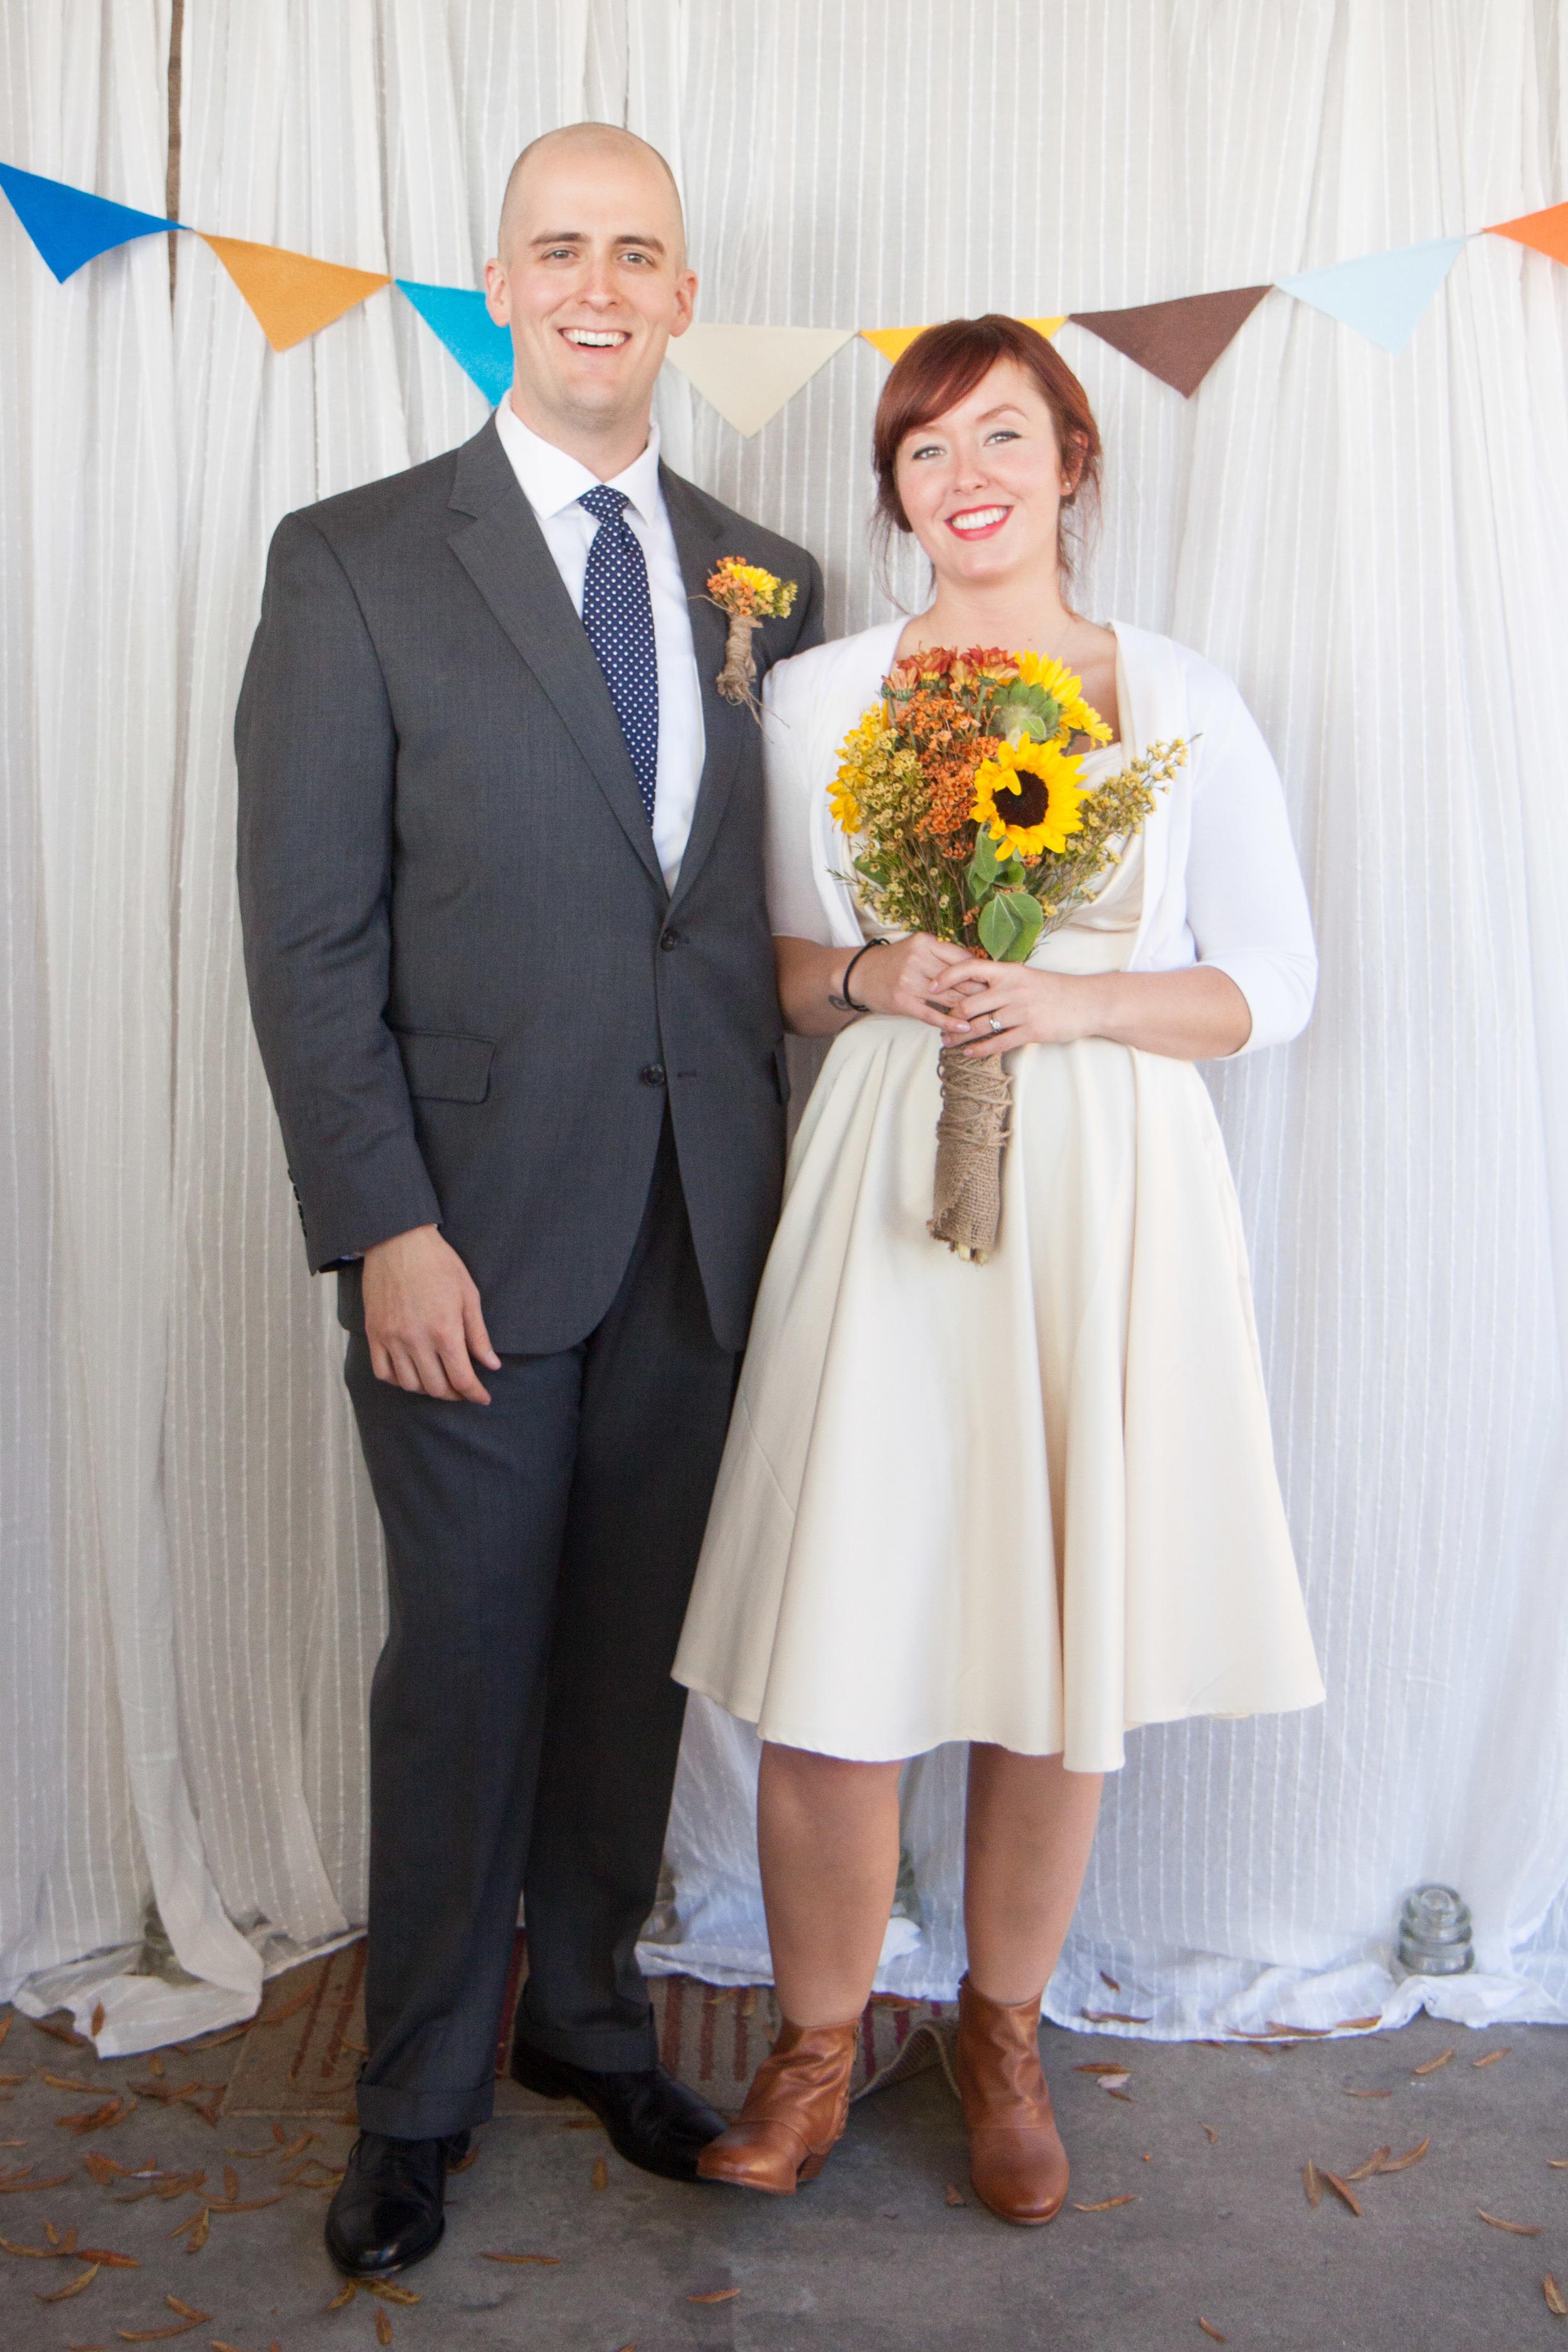 Wilson Bickel Wedding - Family Photos (4 of 25).jpg